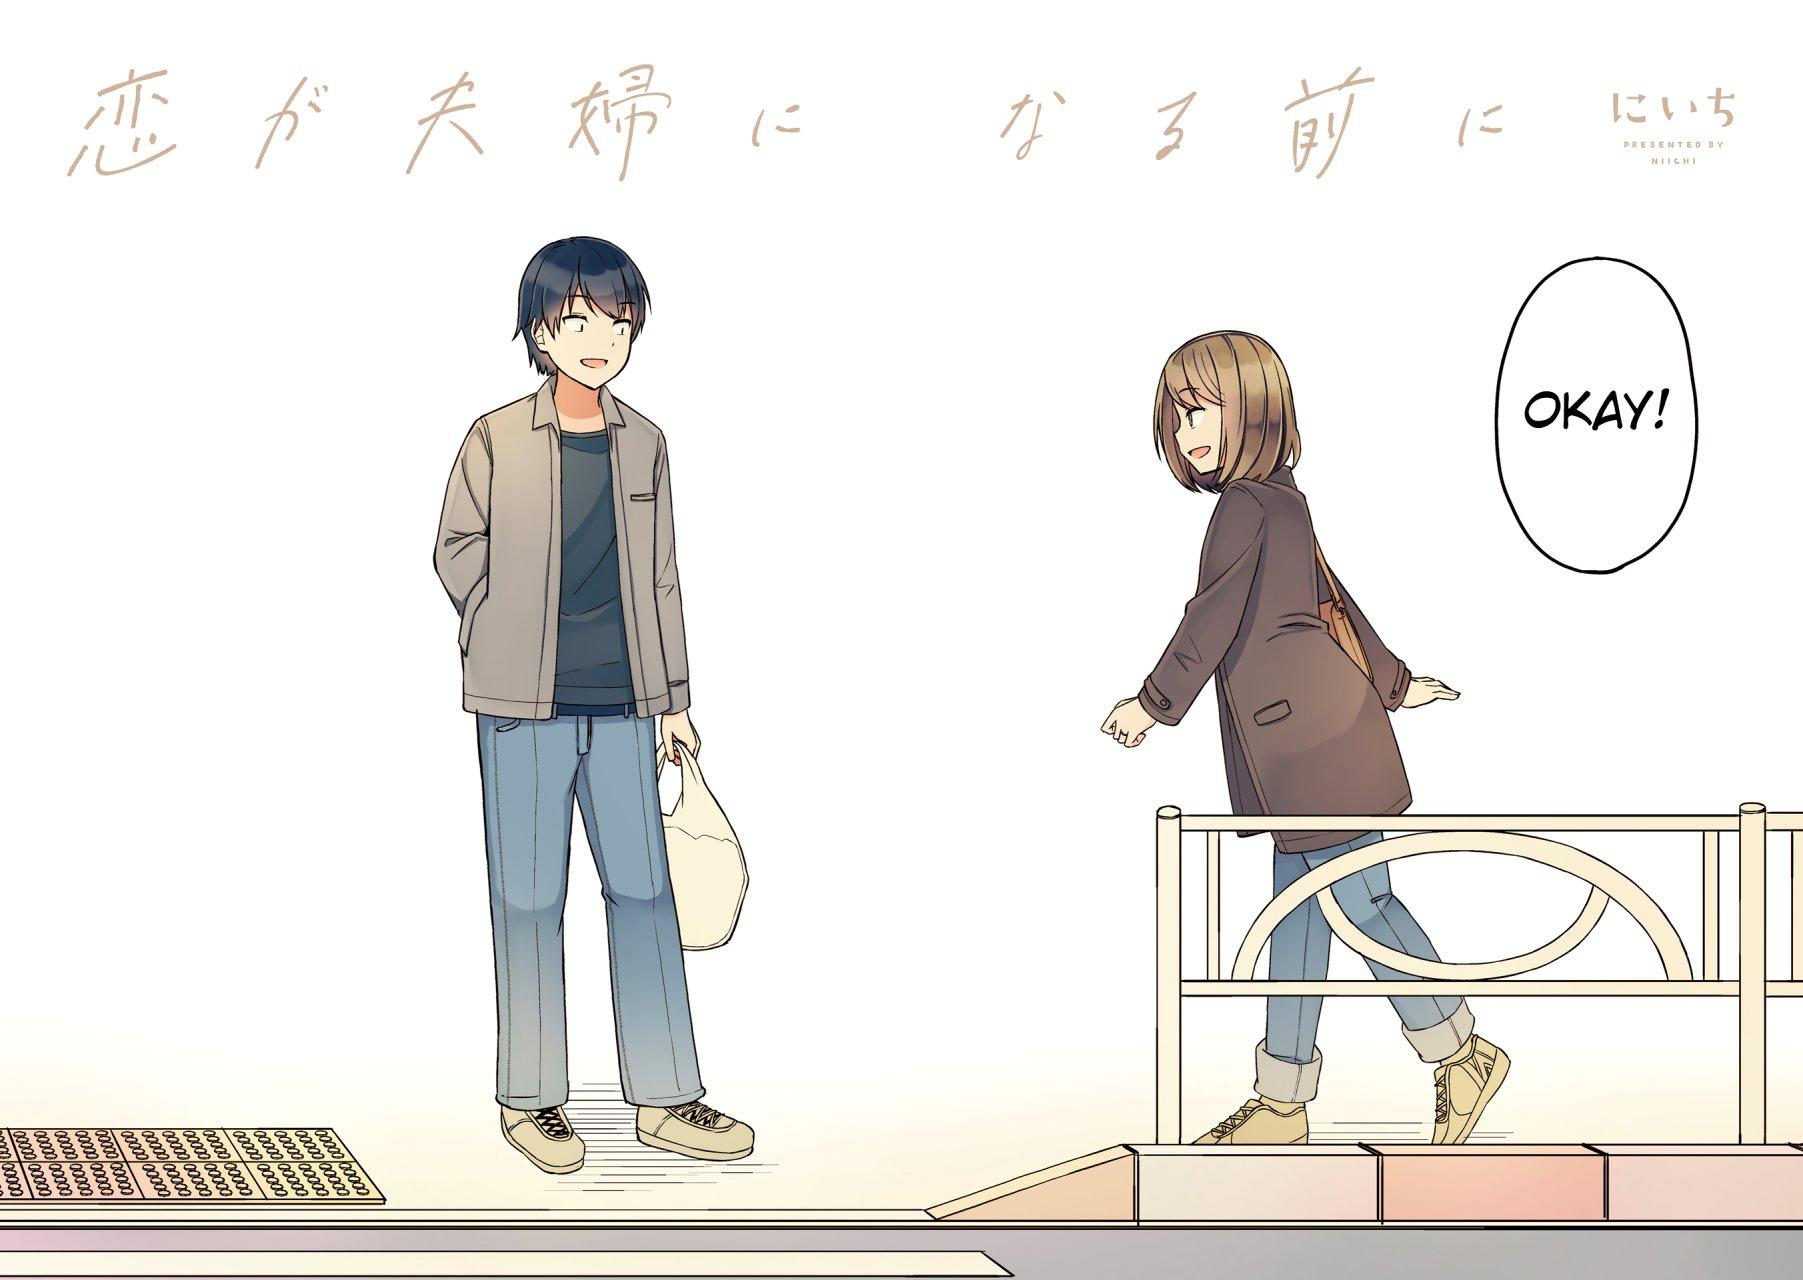 https://nine.mangadogs.com/es_manga/pic8/60/36668/946546/4d4a3c8dcb1e40abde8d093bb247683e.jpg Page 21